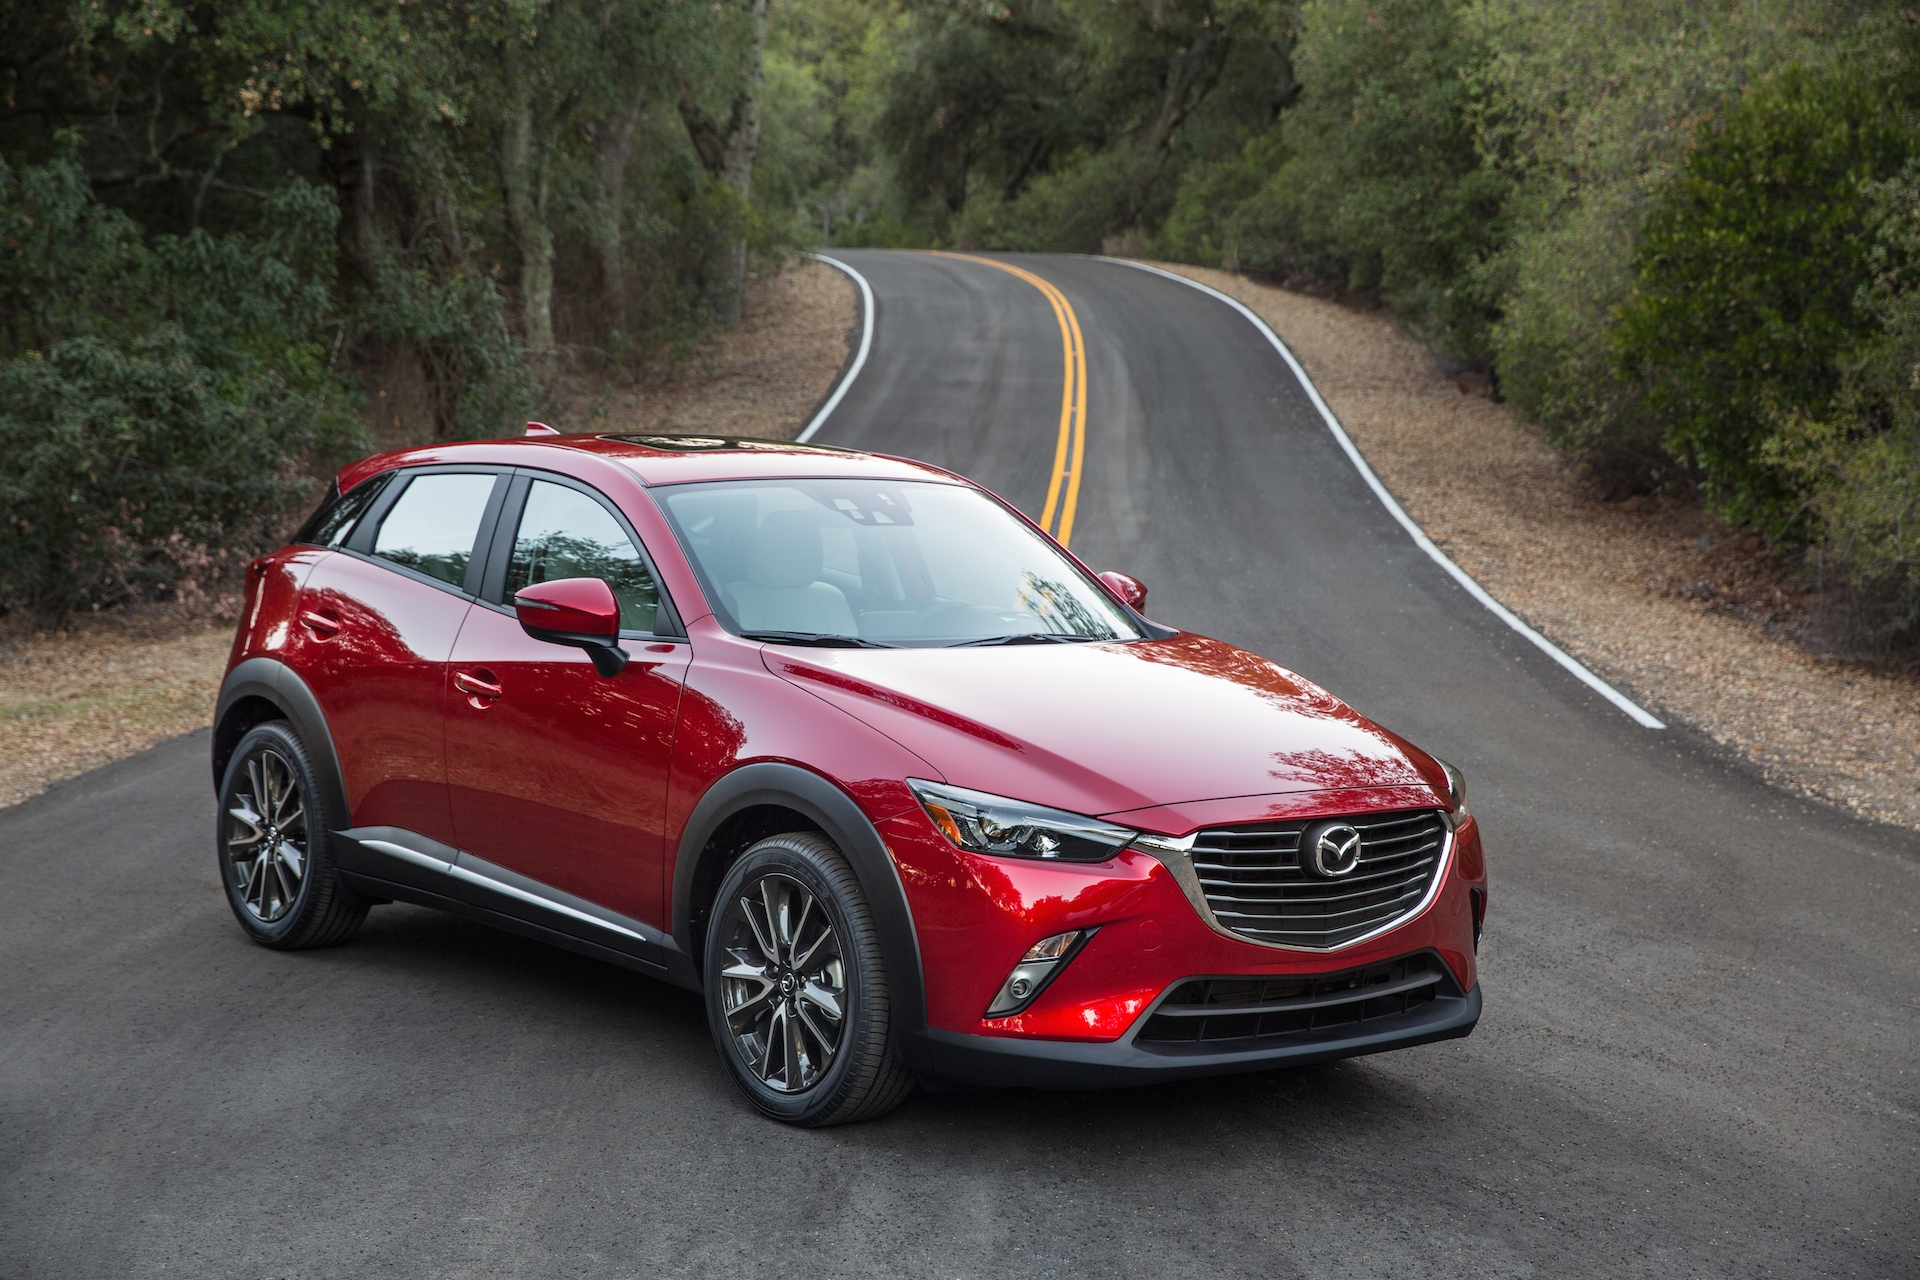 2016-Mazda-CX-3-two